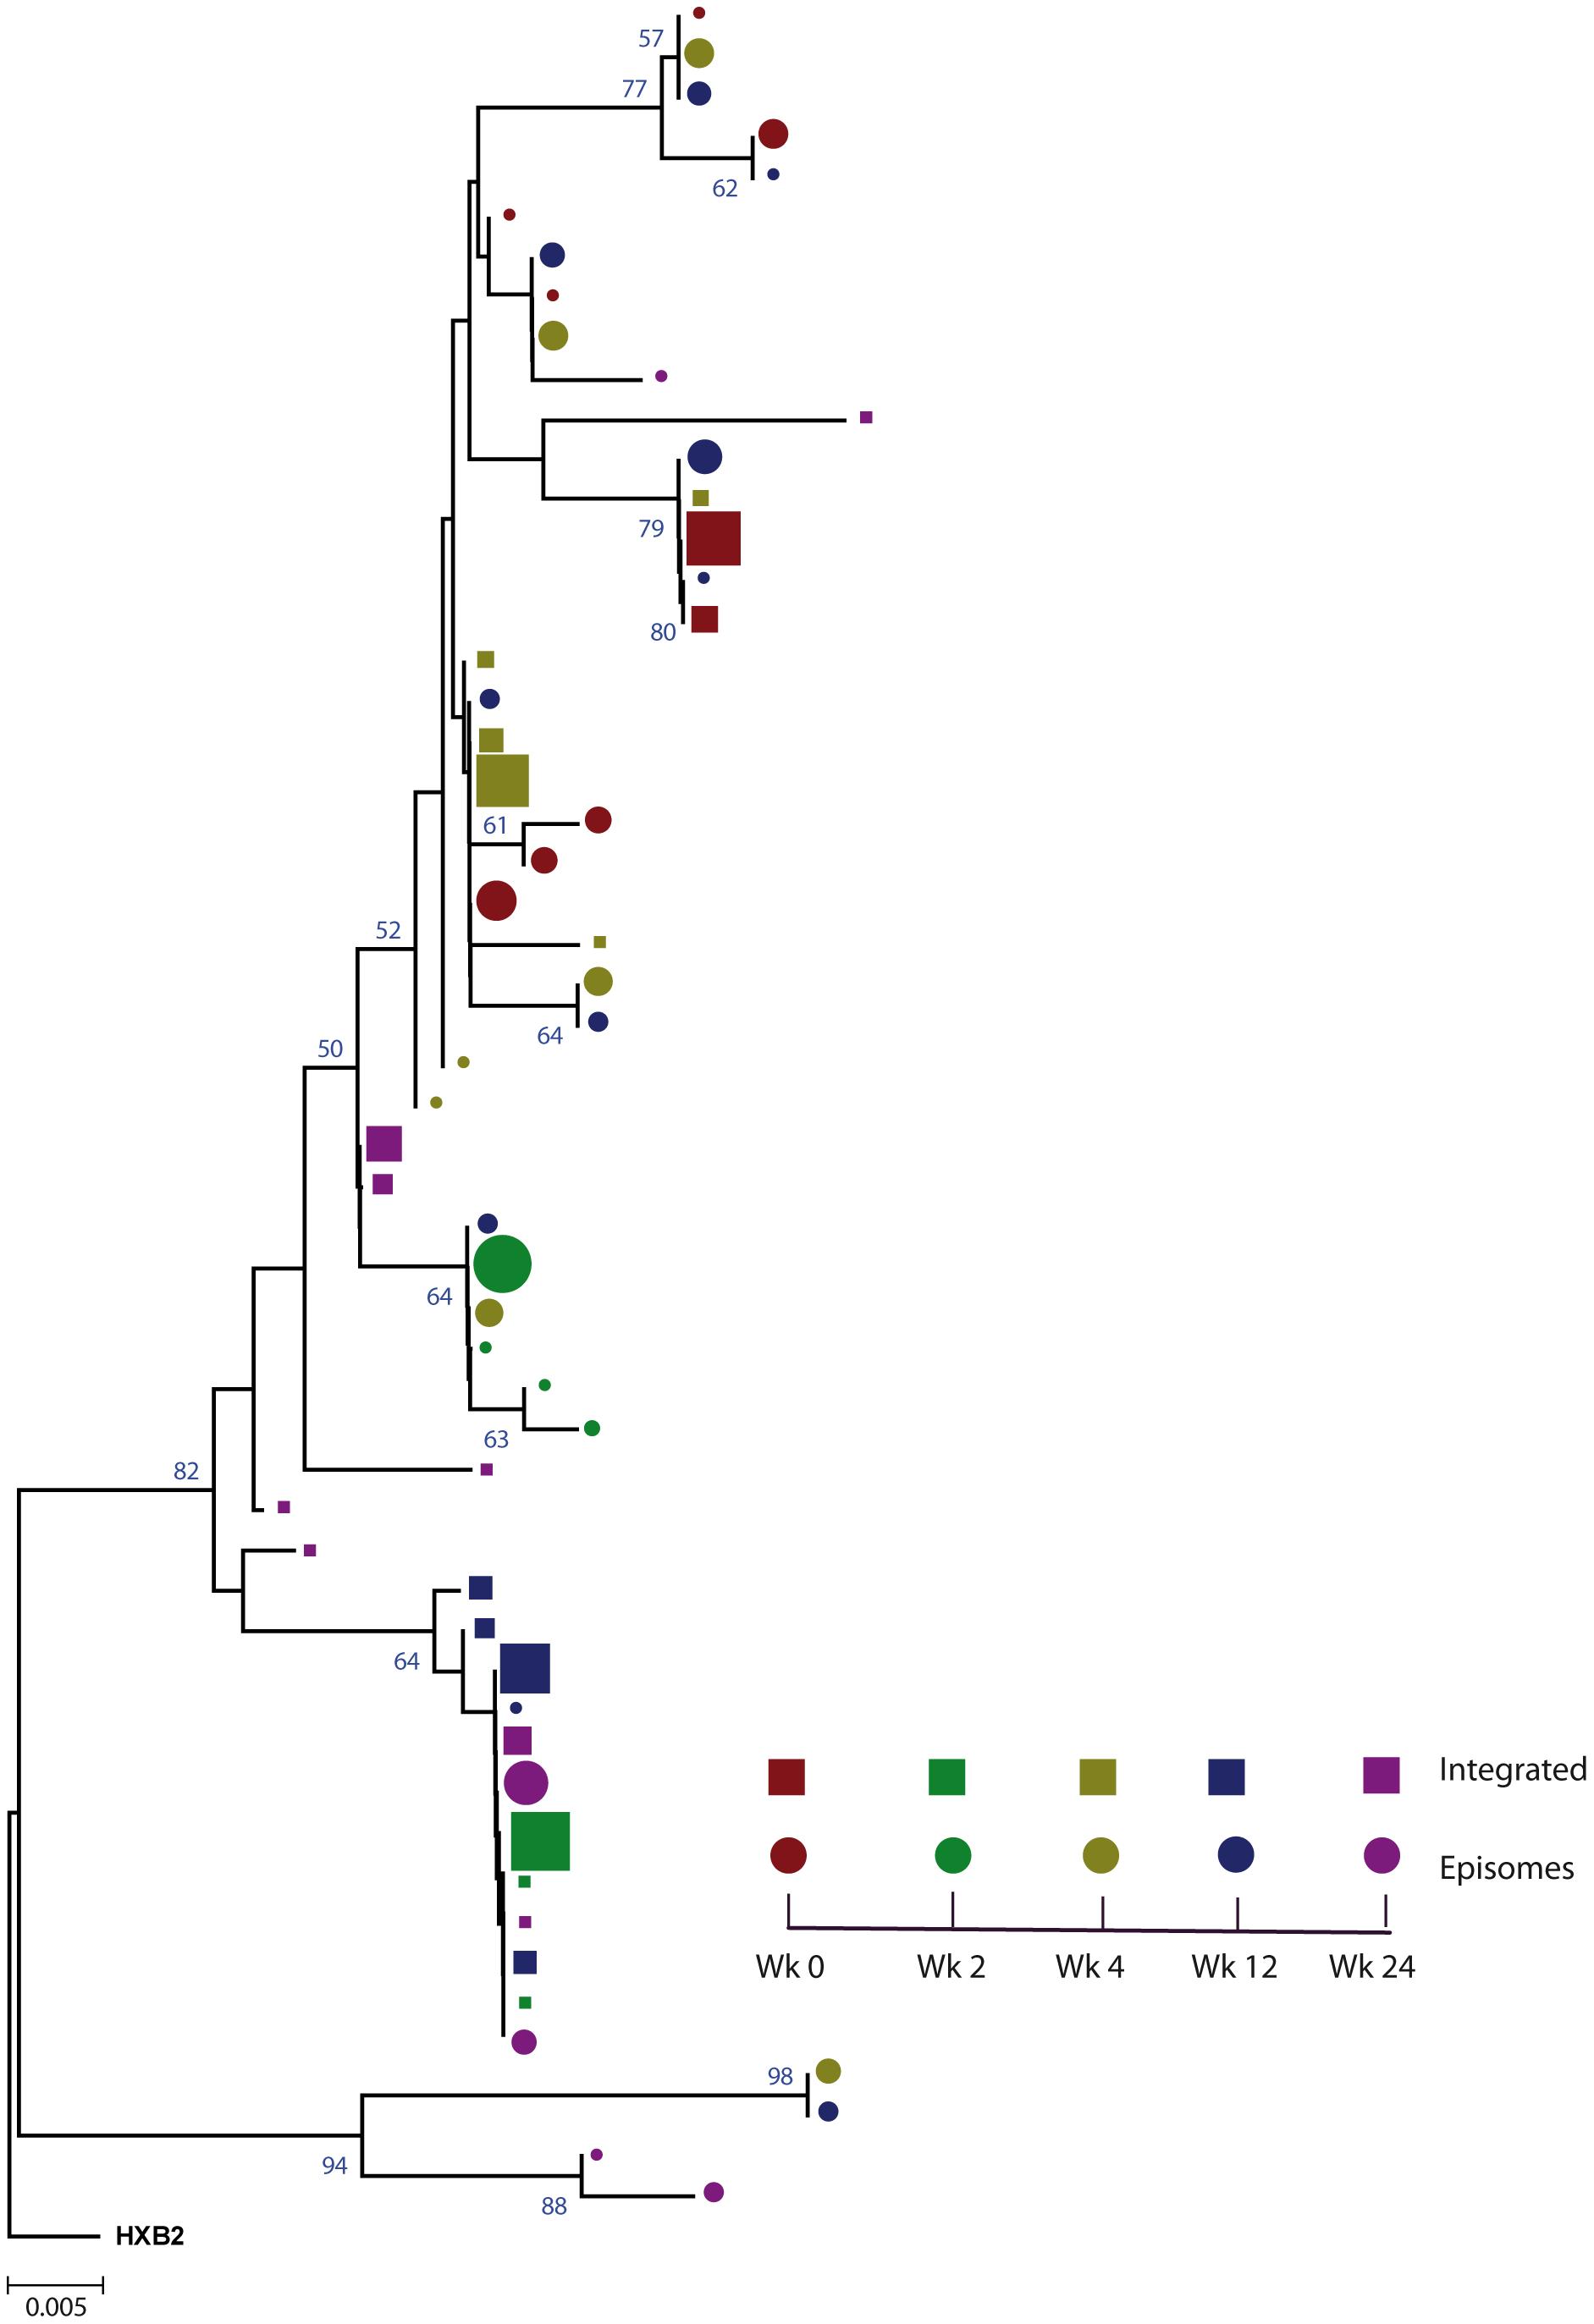 Phylogenetic tree of patient 1.